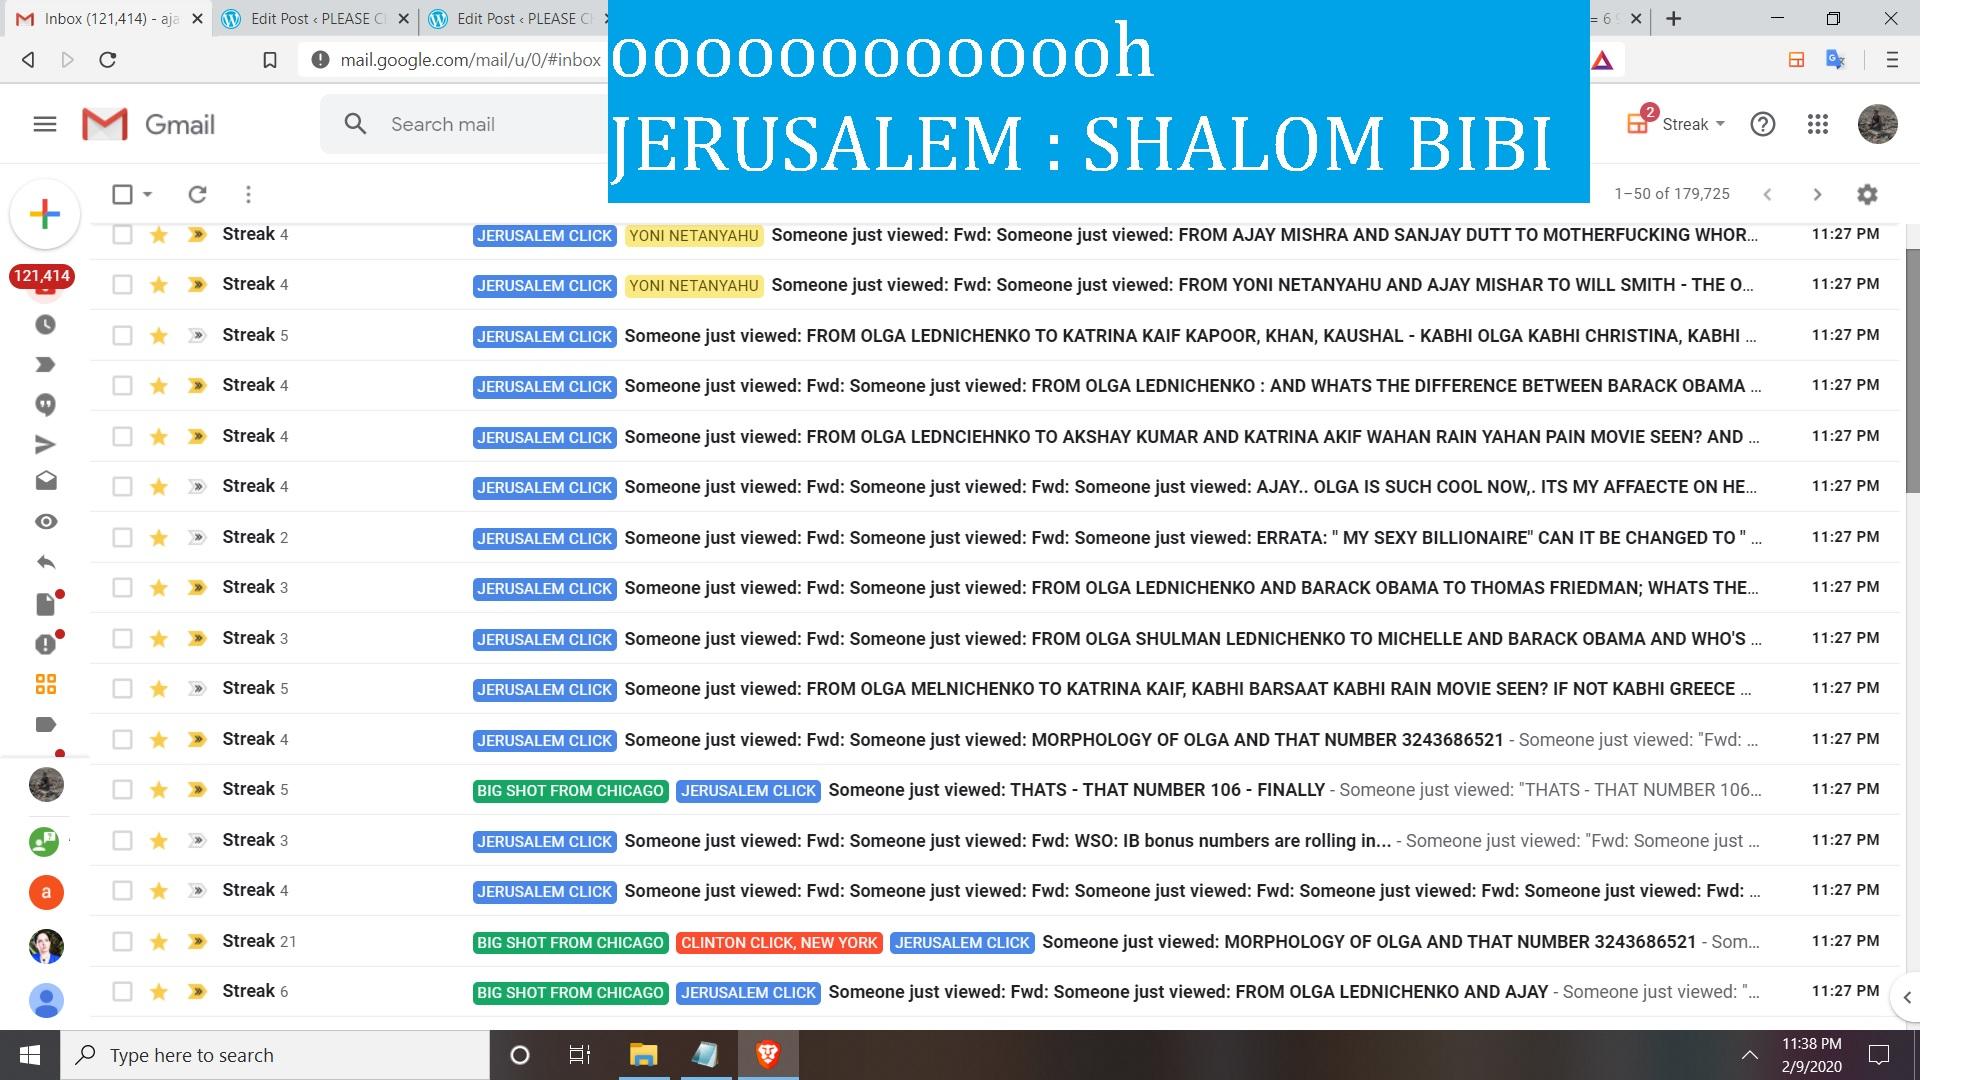 ooooooooooooh JERUSALEM -SHALOM BIBI SO, I JUST CAME BACK. ITS ALMOST MIDNIGHT HERE - WHATS UP